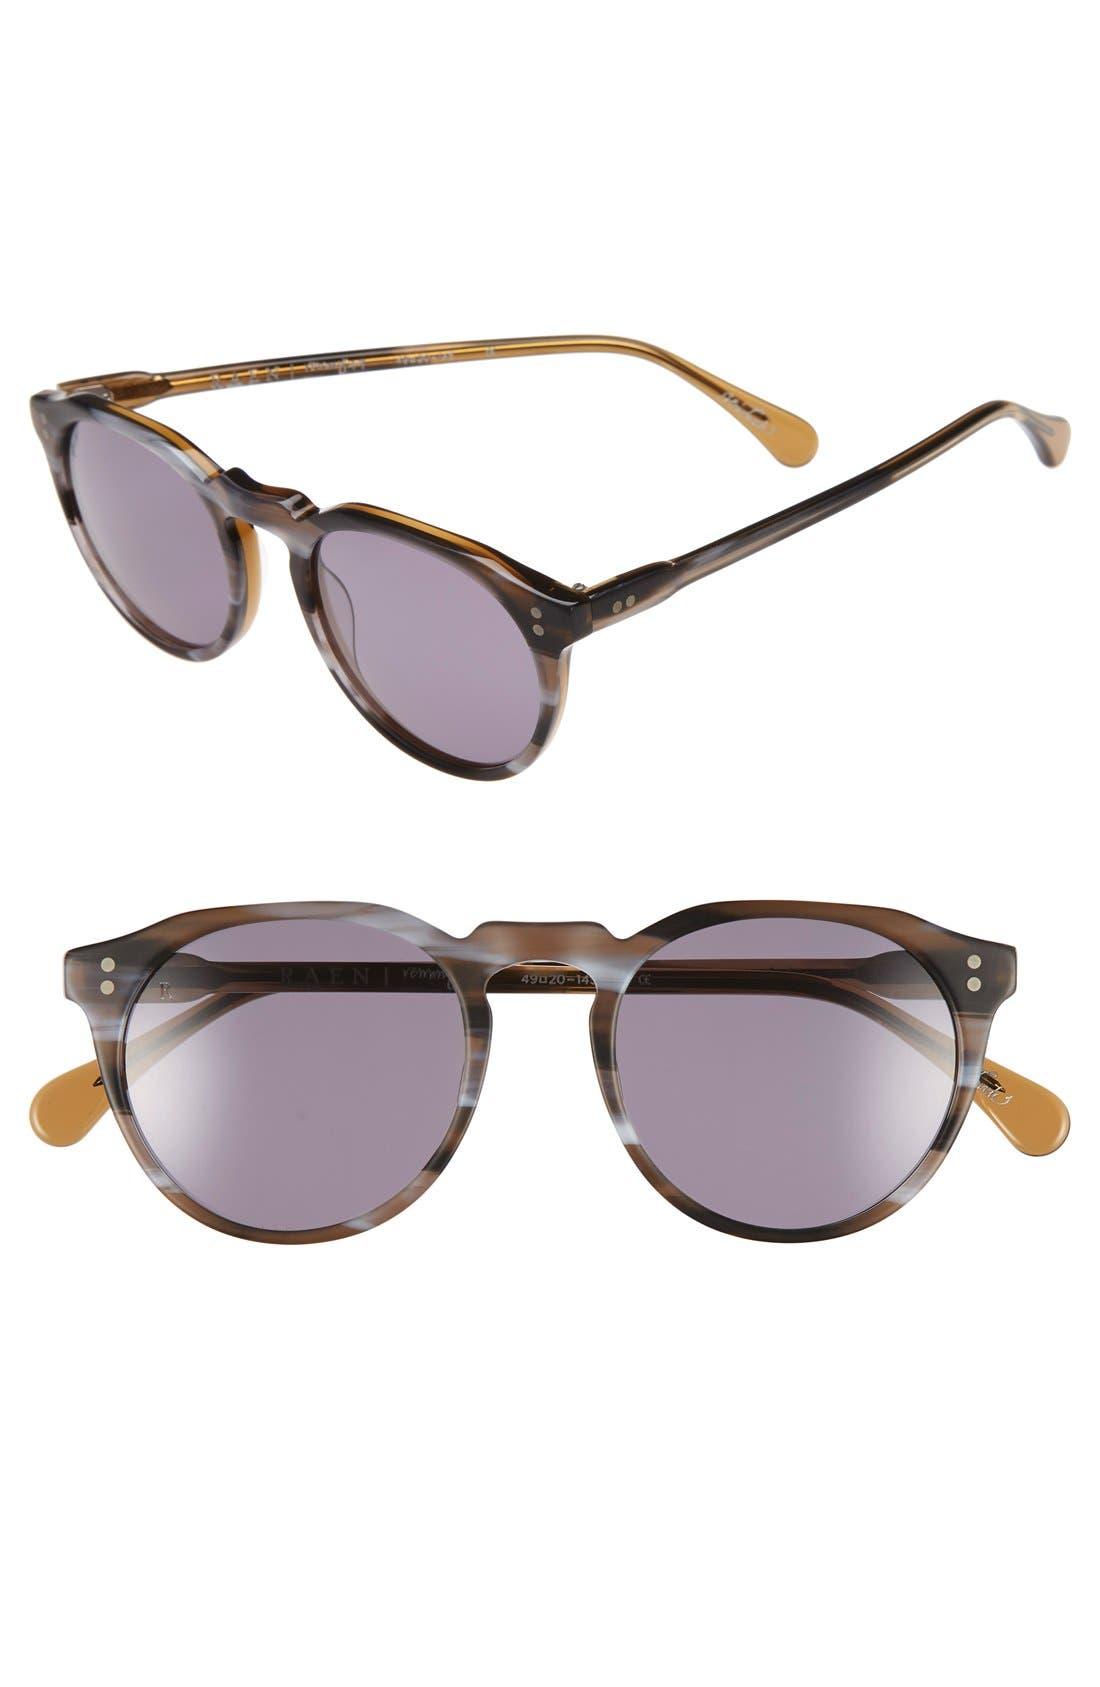 Main Image - RAEN 'Remmy' 49mm Polarized Sunglasses